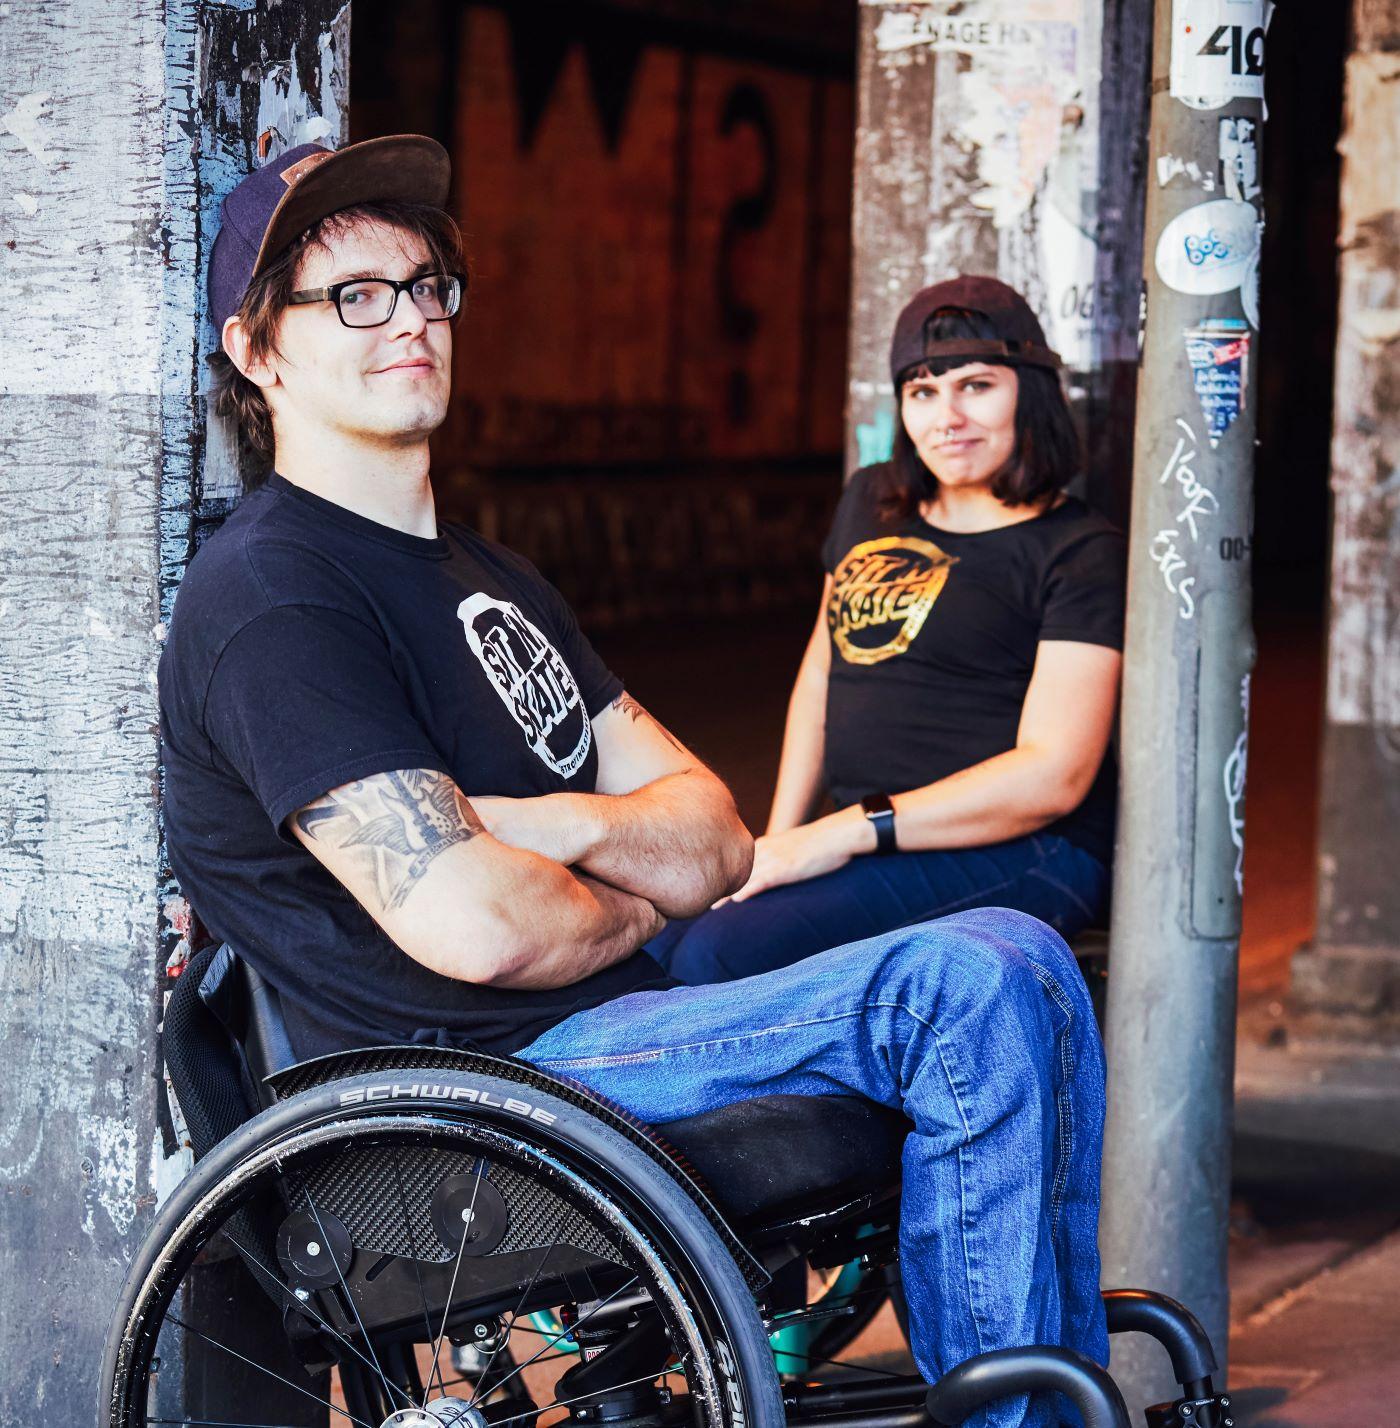 Lisa Schmidt & David Lebuser von sit'n'skate.